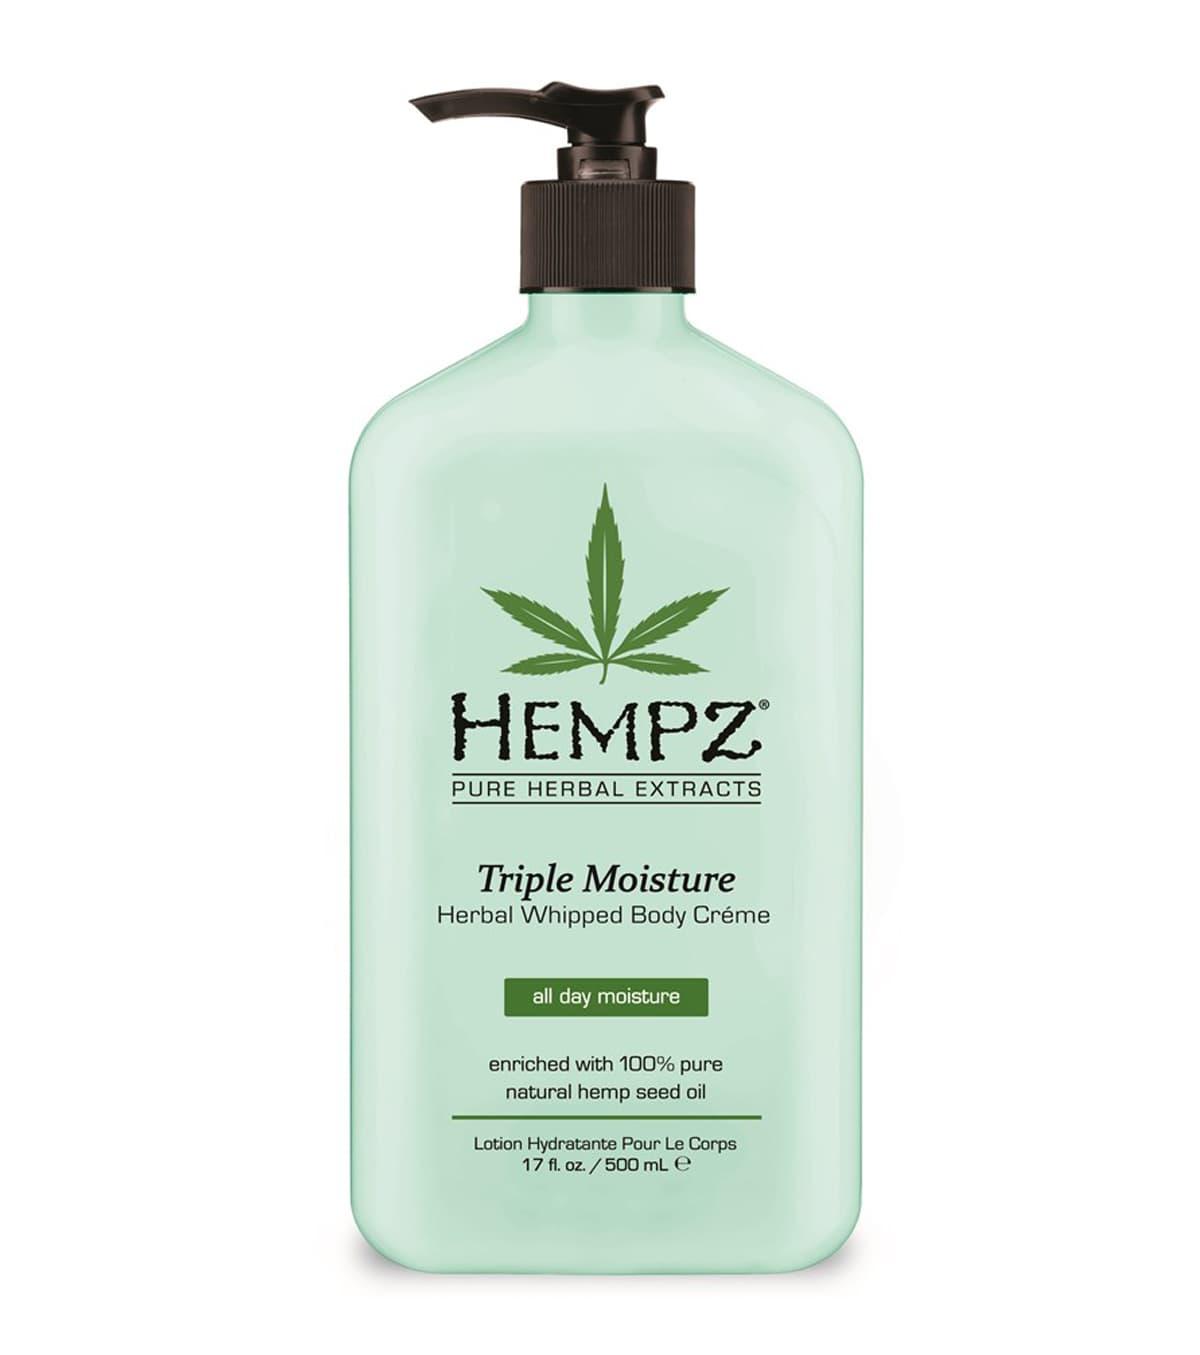 Hempz Triple Moisturizer Herbal Whipped Body Creme Молочко Для Тела - Тройное Увлажнение